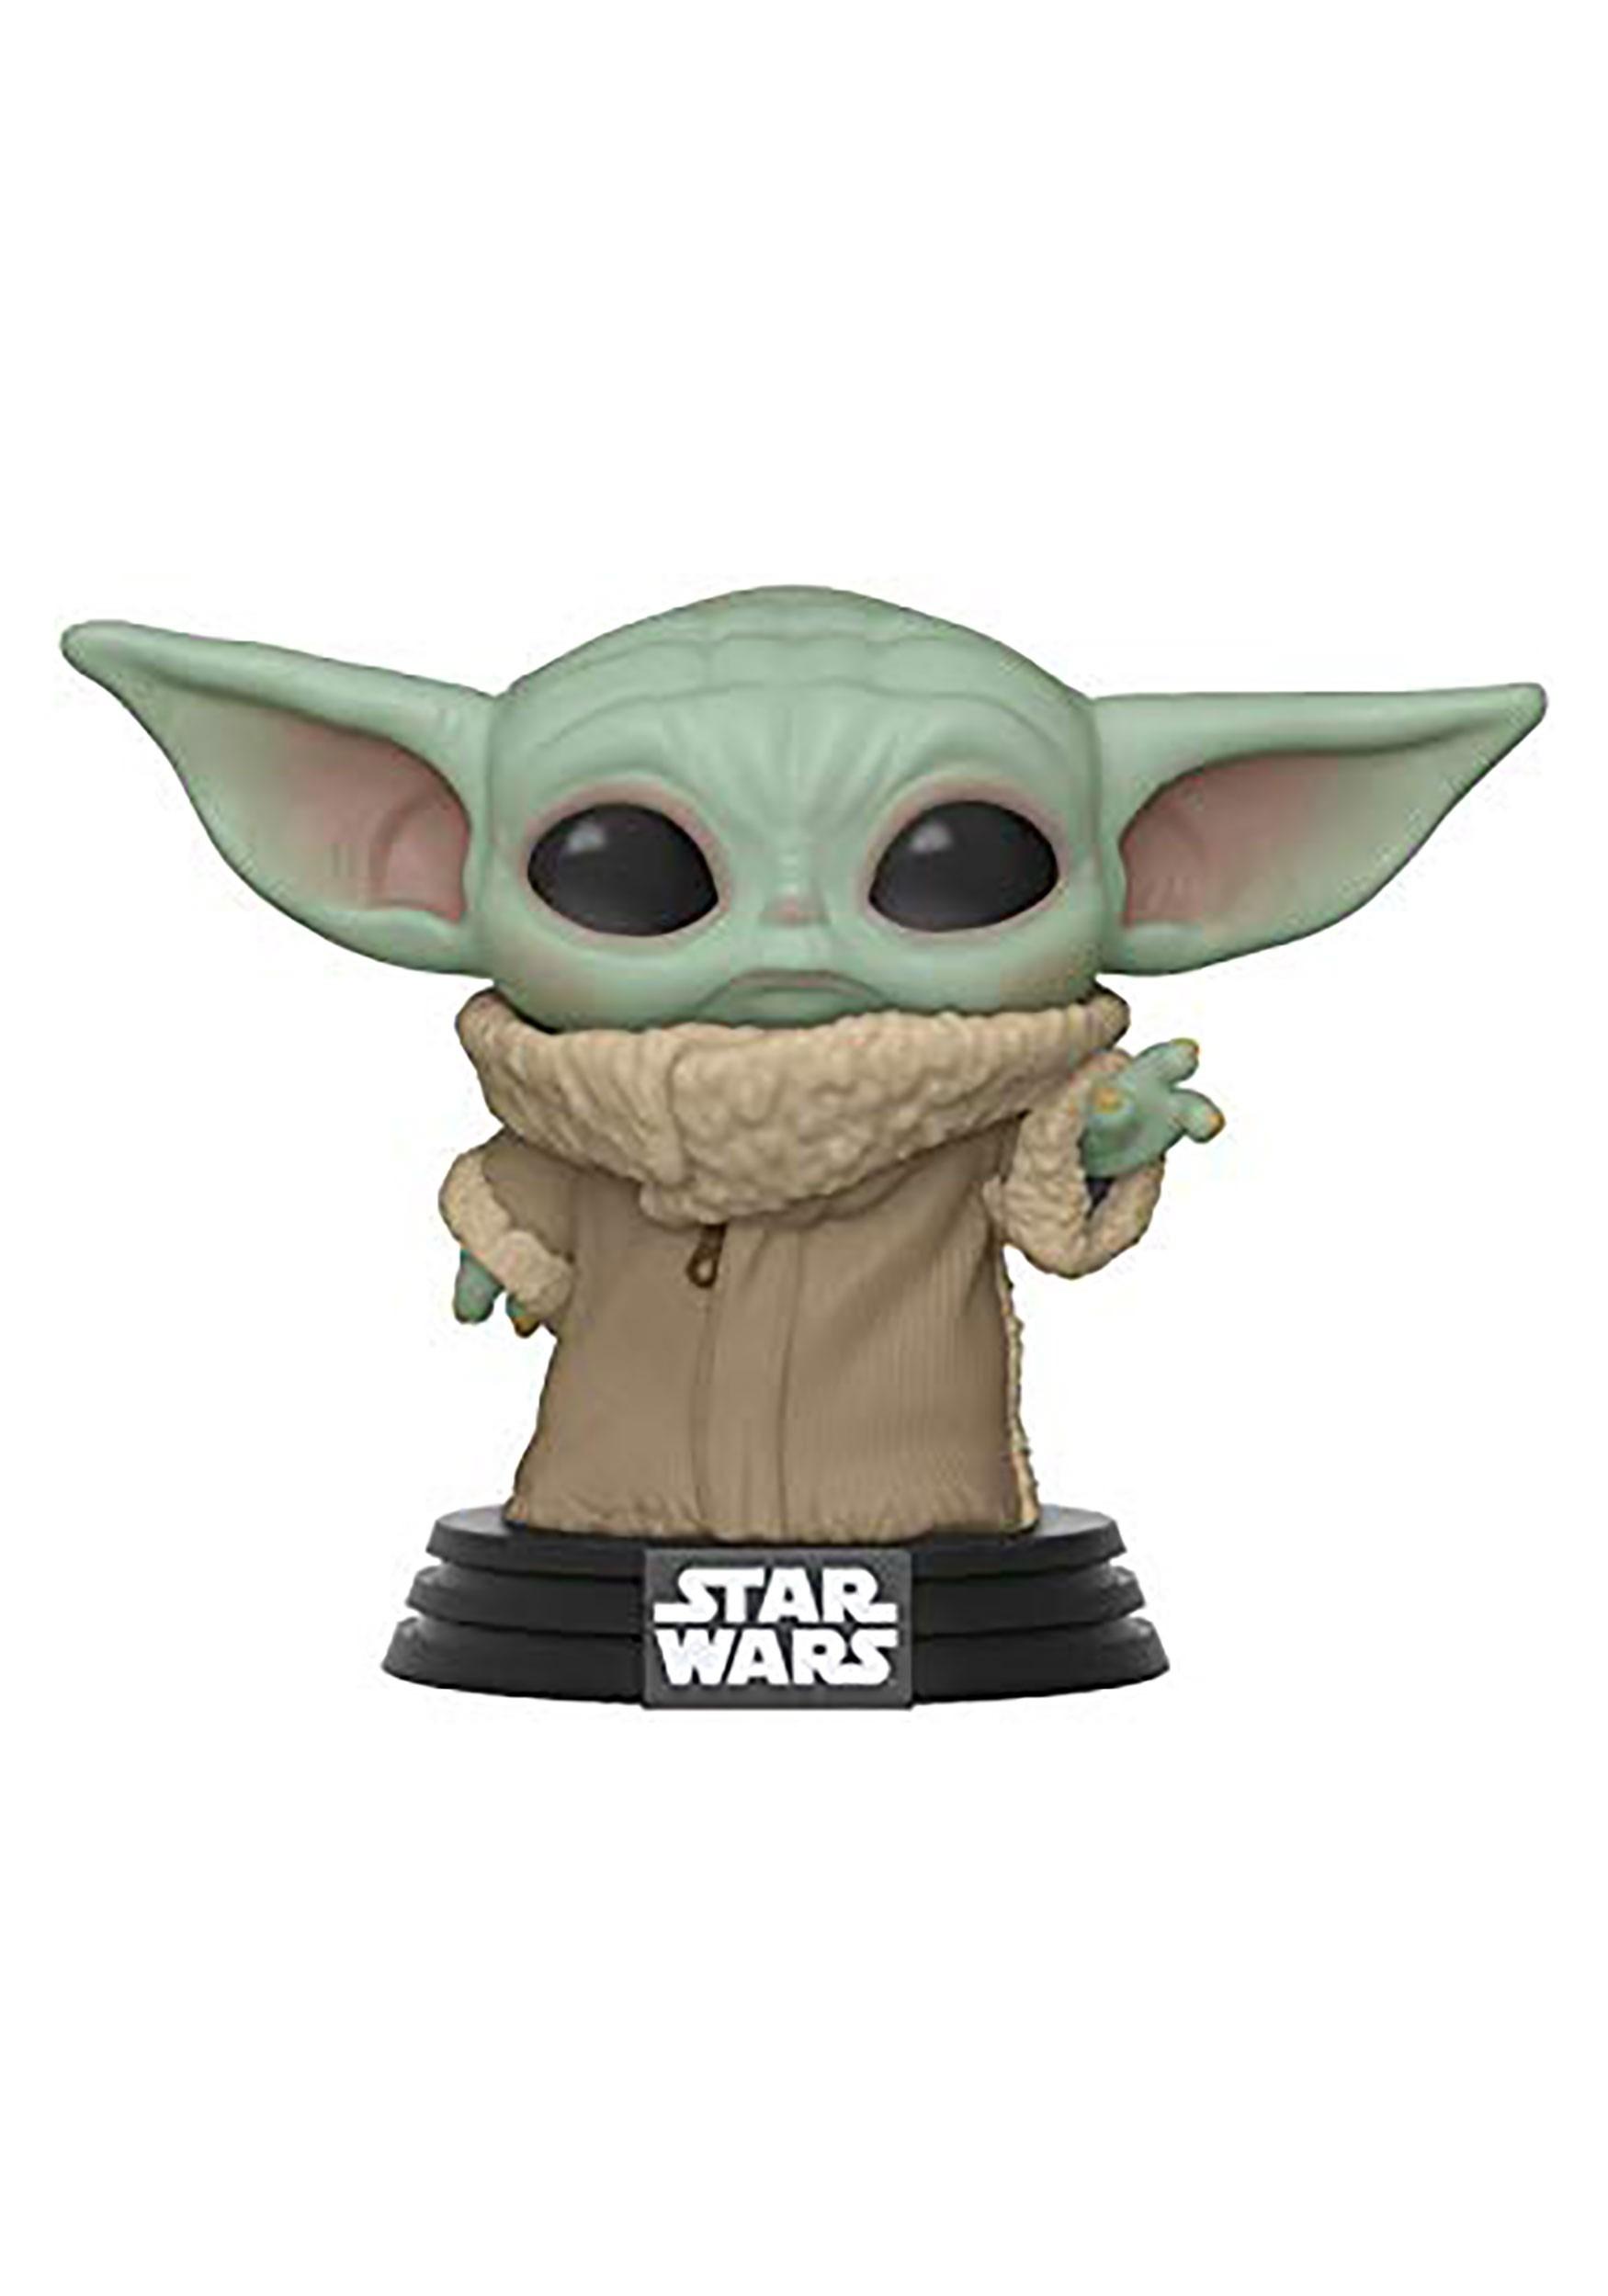 Pop! Star Wars: The Child - Mandalorian Bobblehead Figure